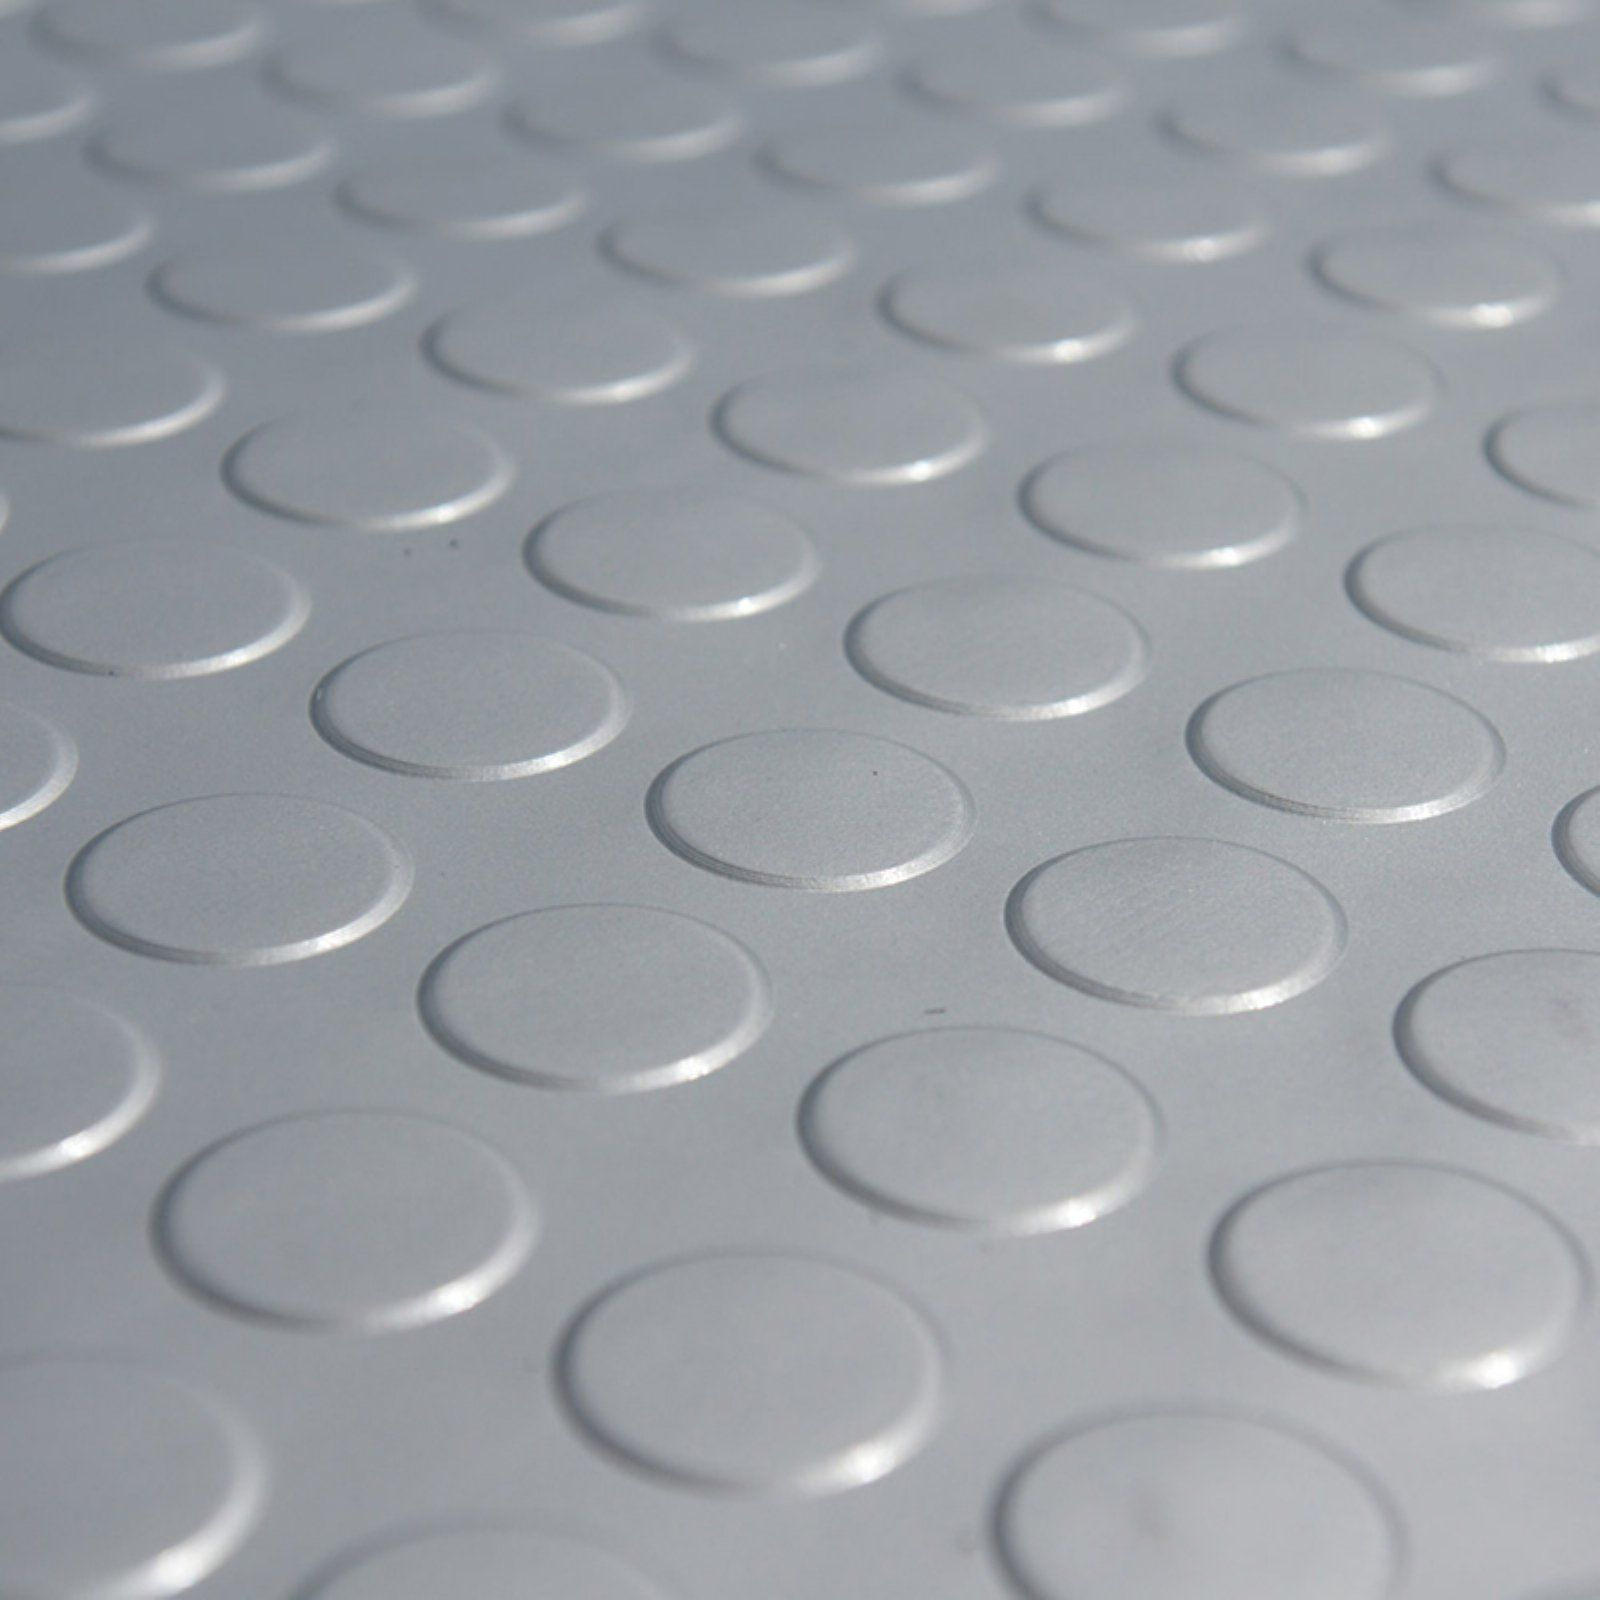 Rubber Cal Coin Grip Metallic Pvc Garage Flooring Silver In